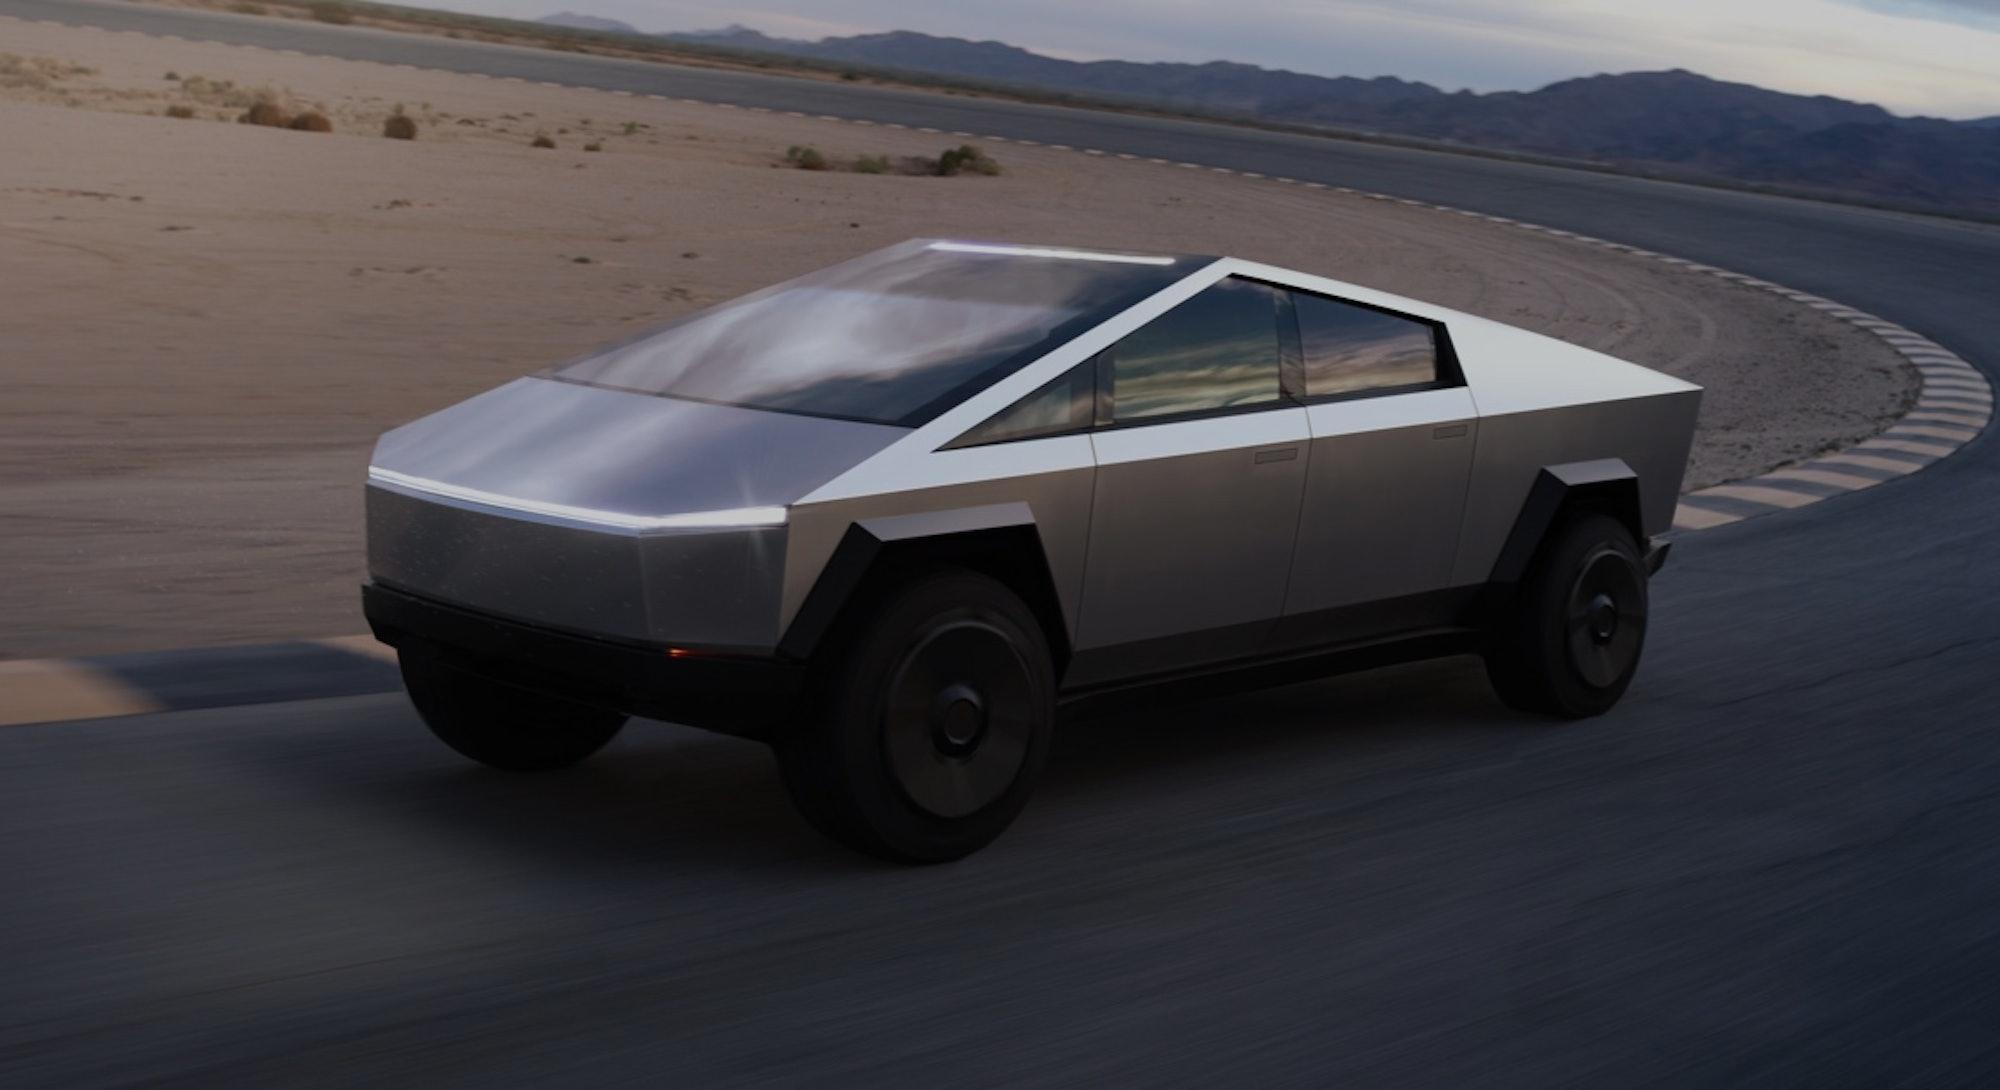 Tesla's electric pickup truck, the Cybertruck. Electric vehicles. EV. EVs. Electric cars. Automotive...